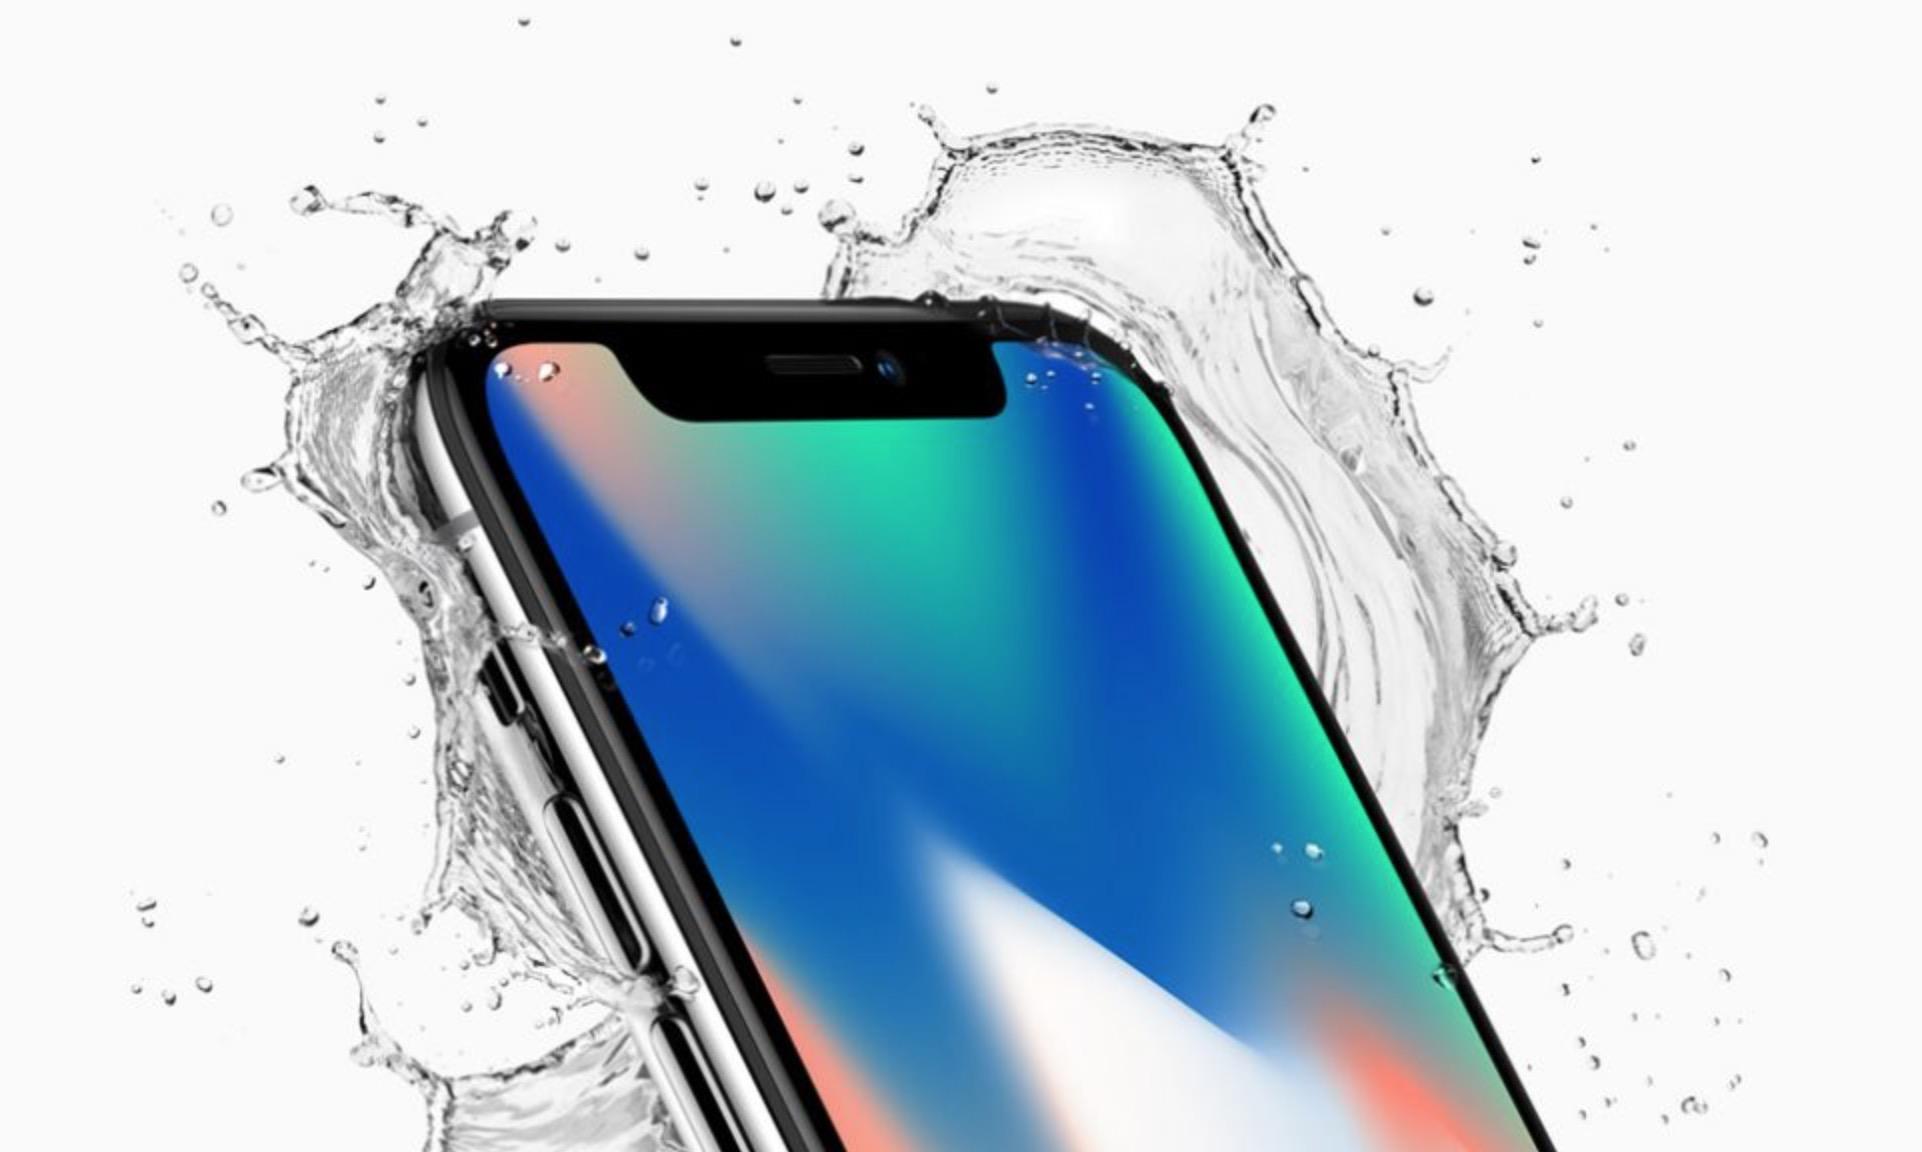 Prezzo smartphone iPhone X